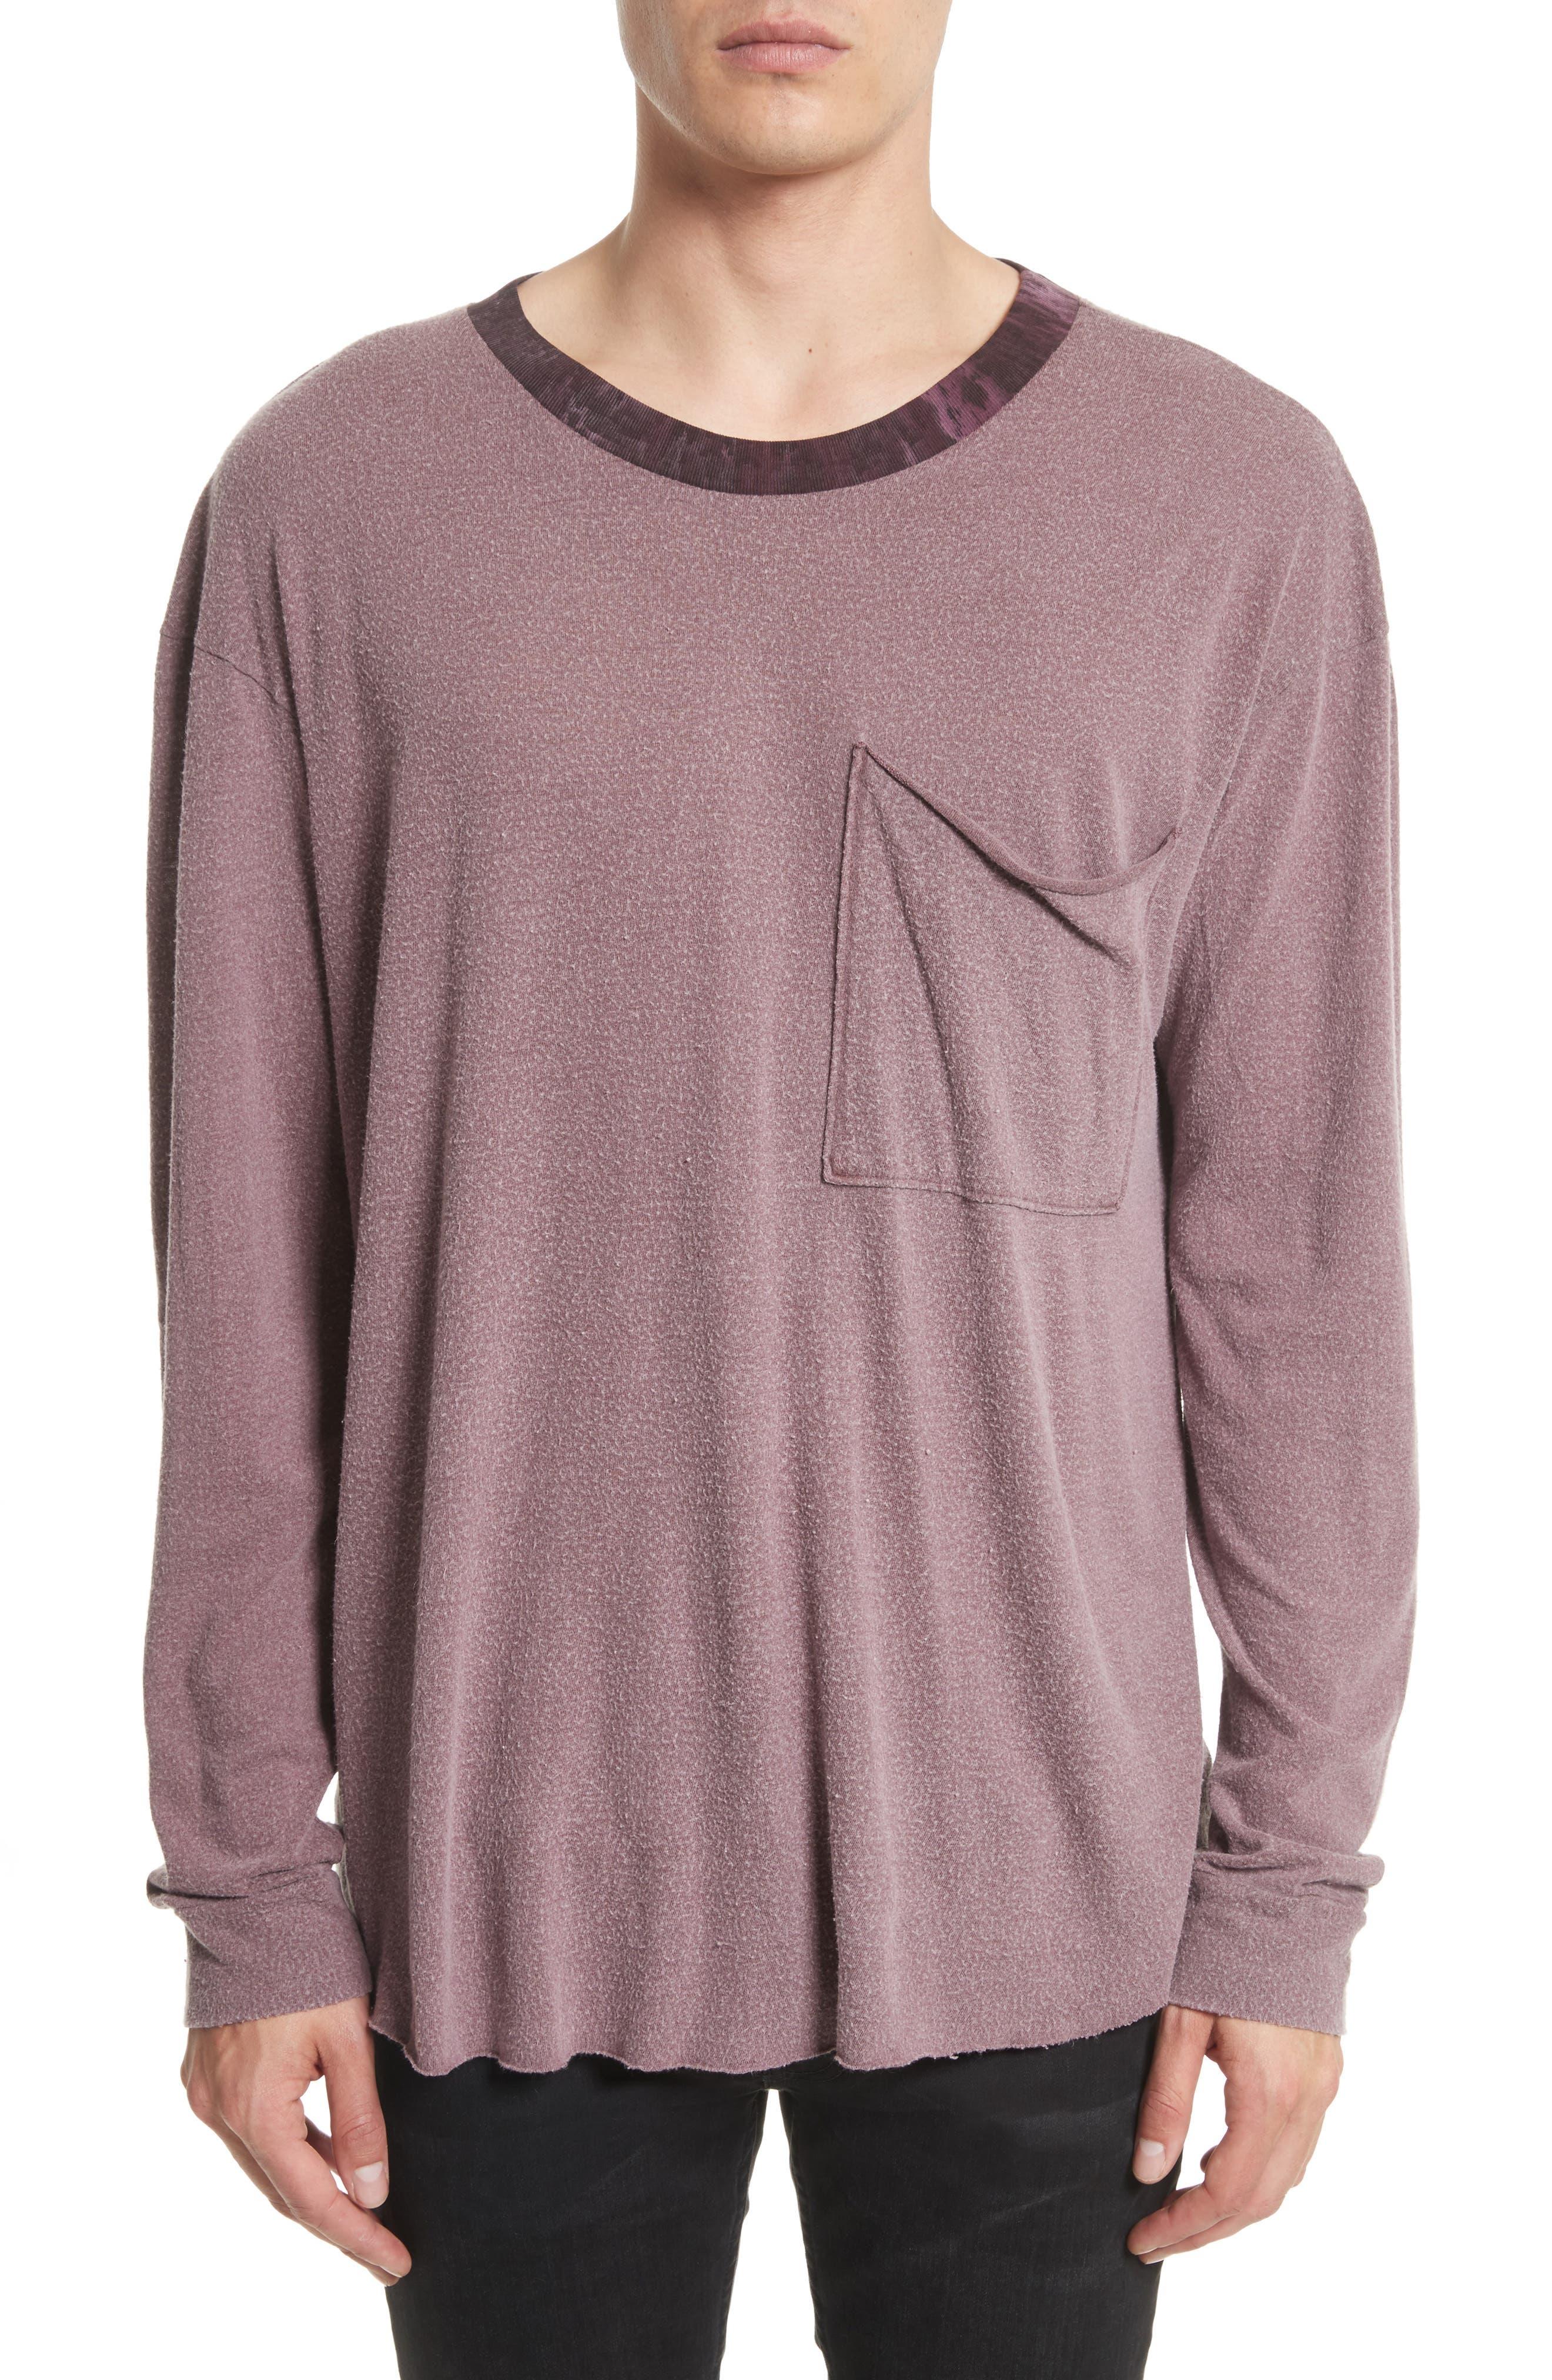 Tide Long Sleeve Pocket T-Shirt,                             Main thumbnail 1, color,                             649